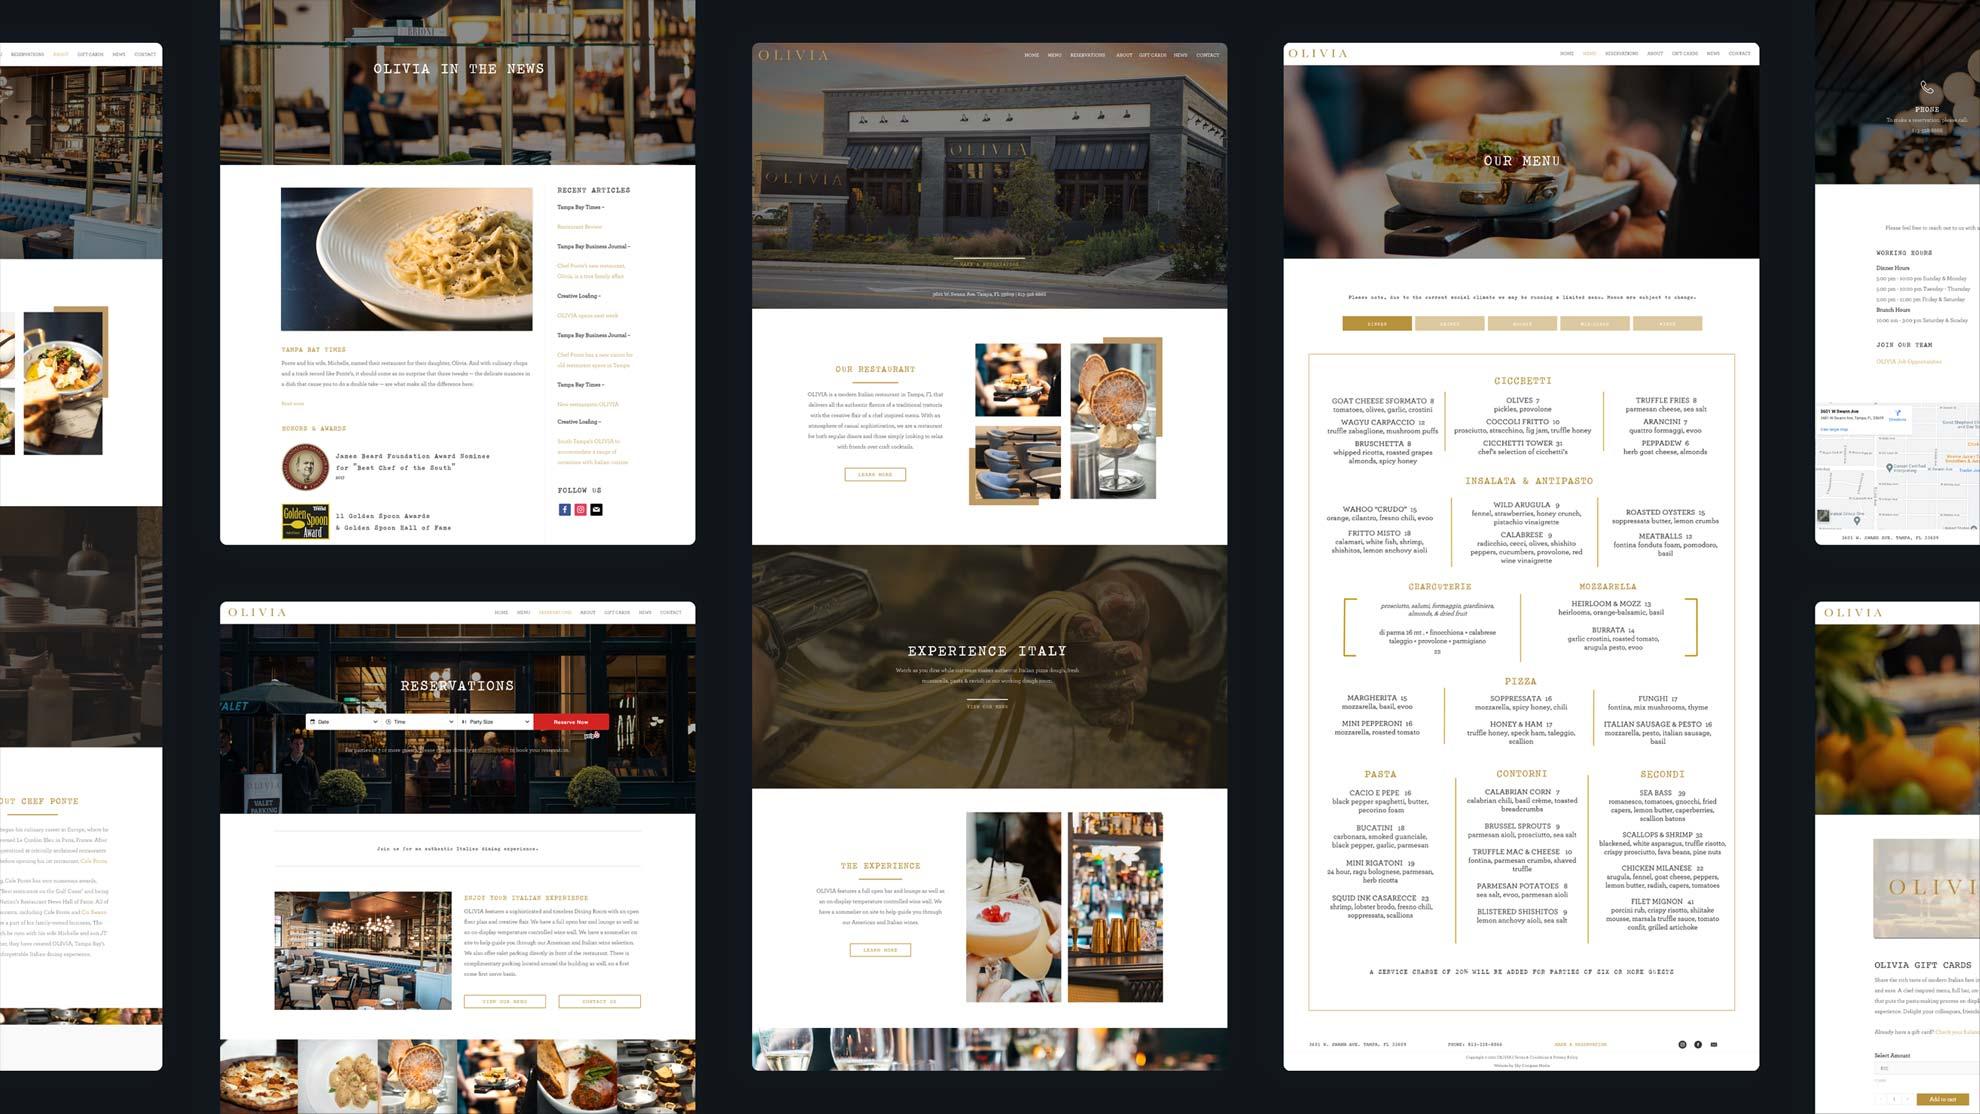 case-study-oliviatampa-website-sky-compass-media